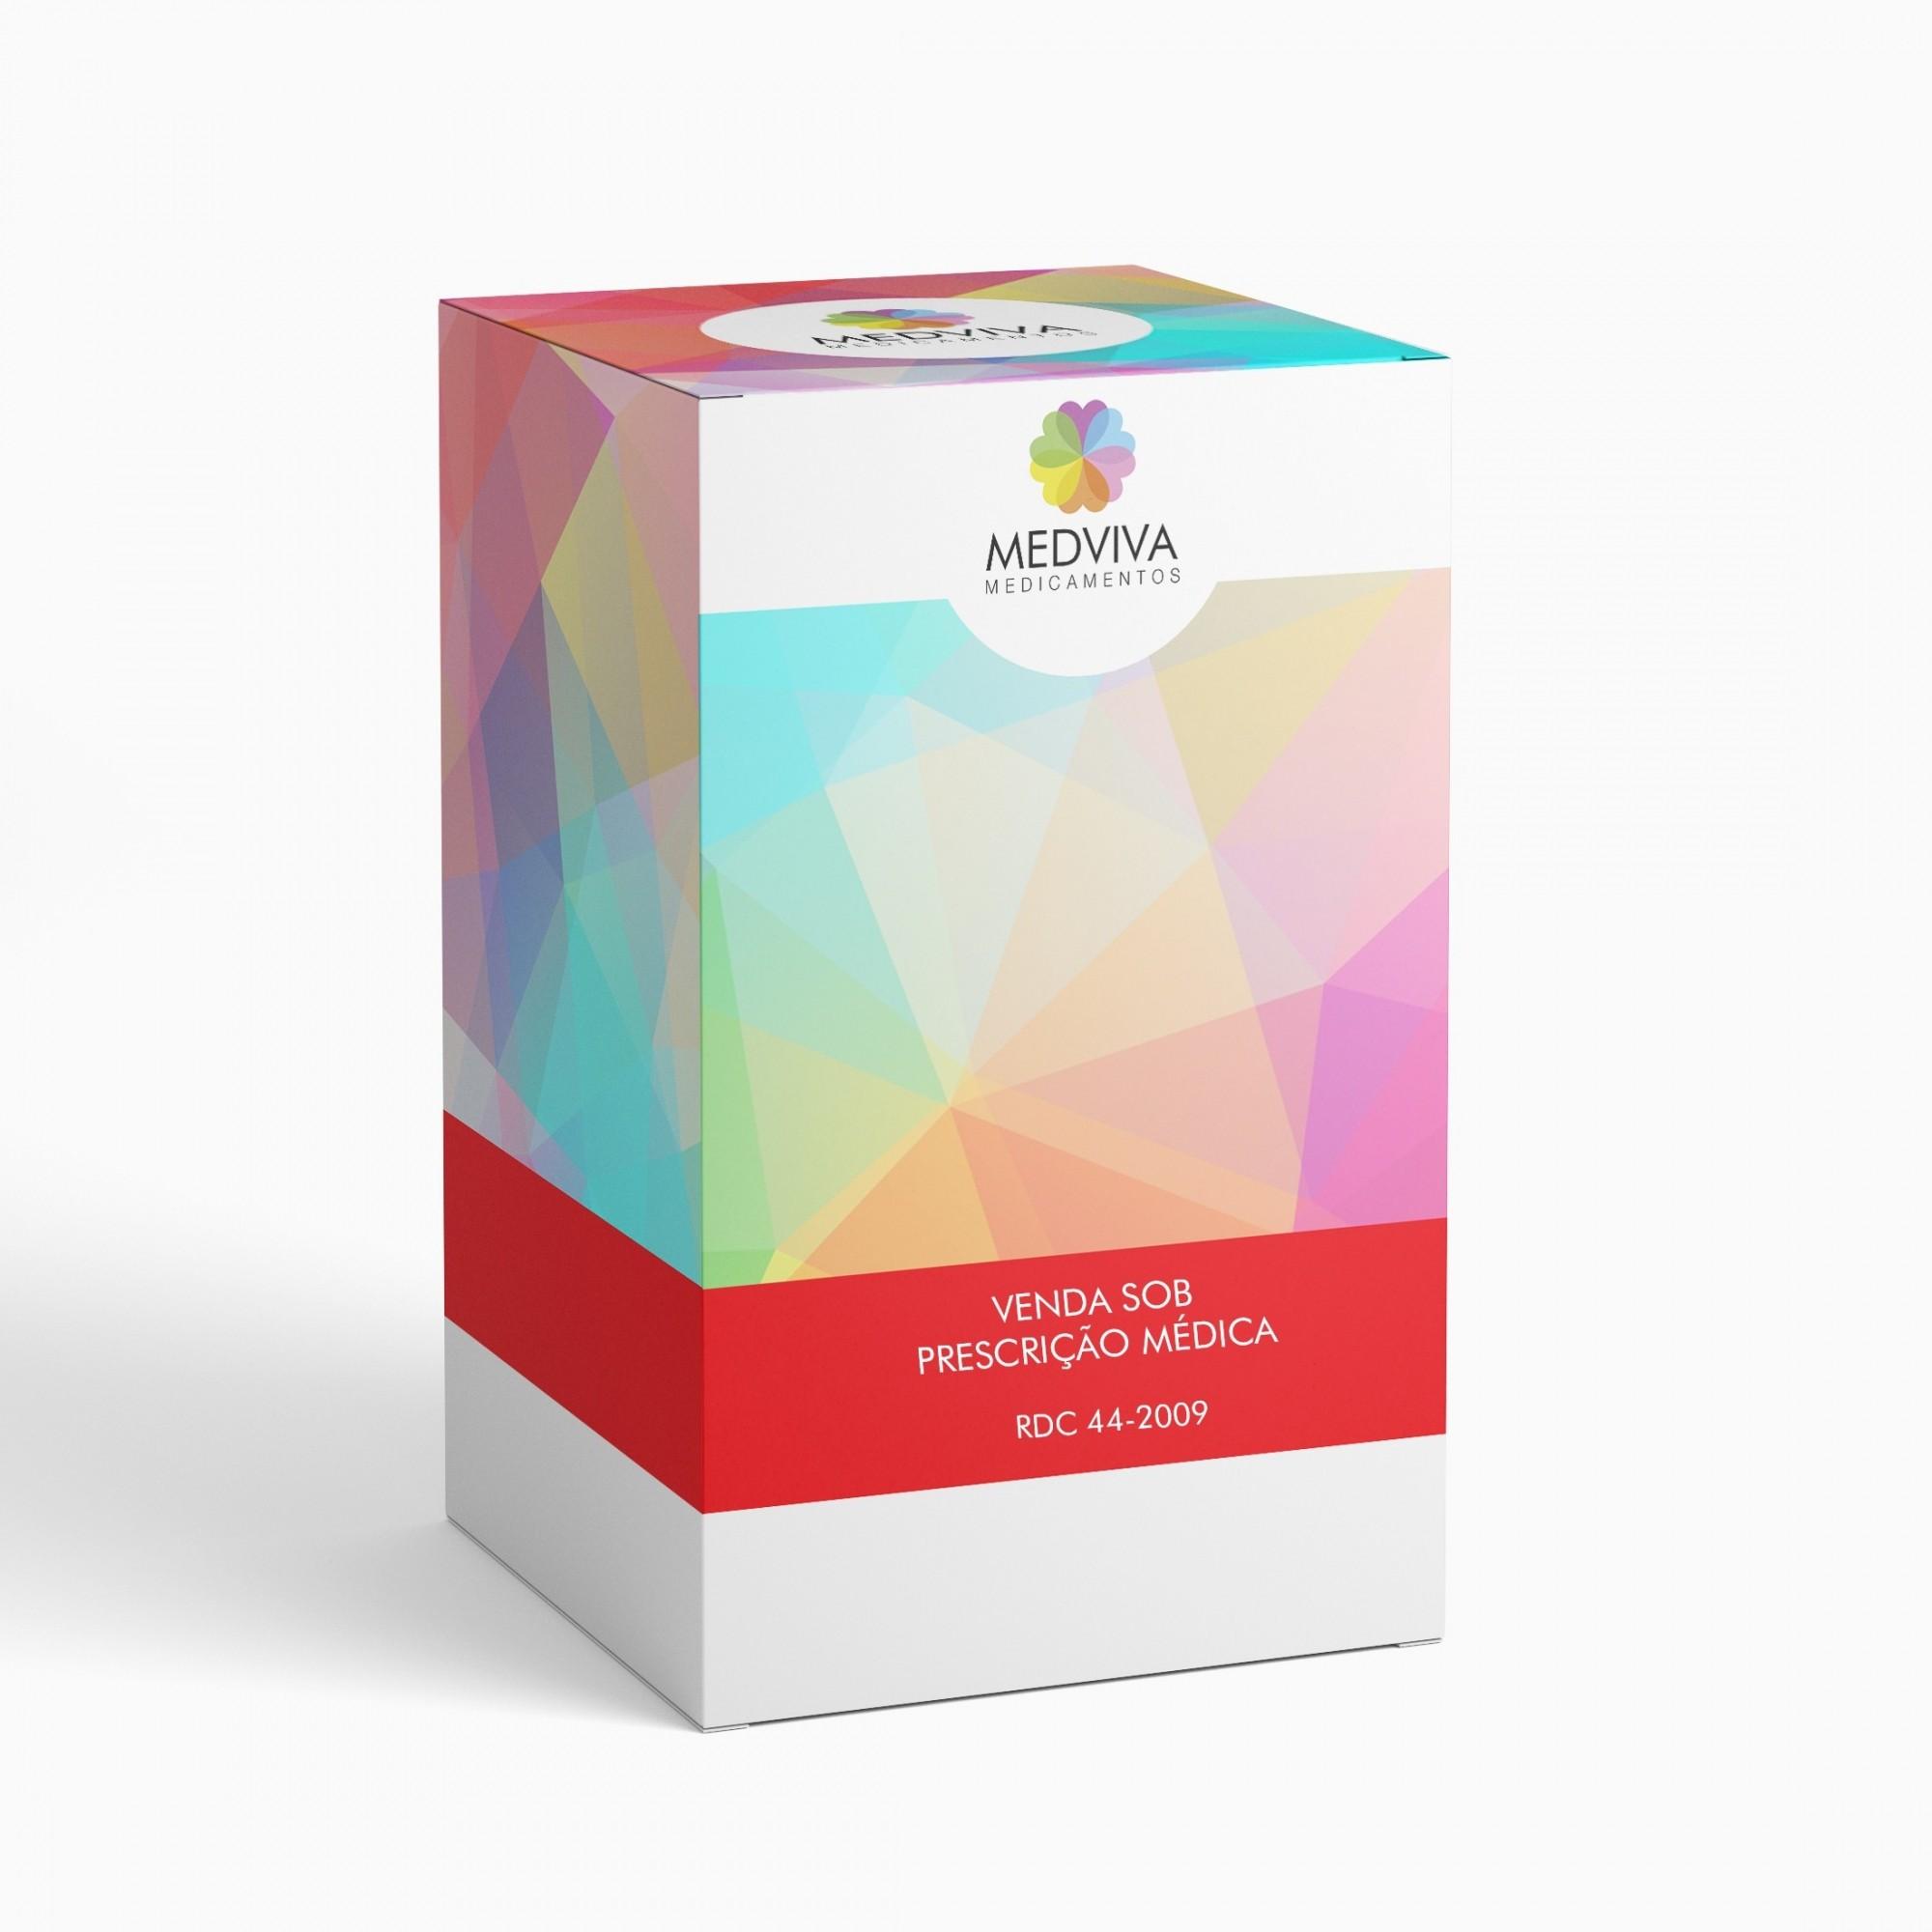 Tansulosina 0,4 mg 20 Comprimidos  Geolab Val: 04/2021